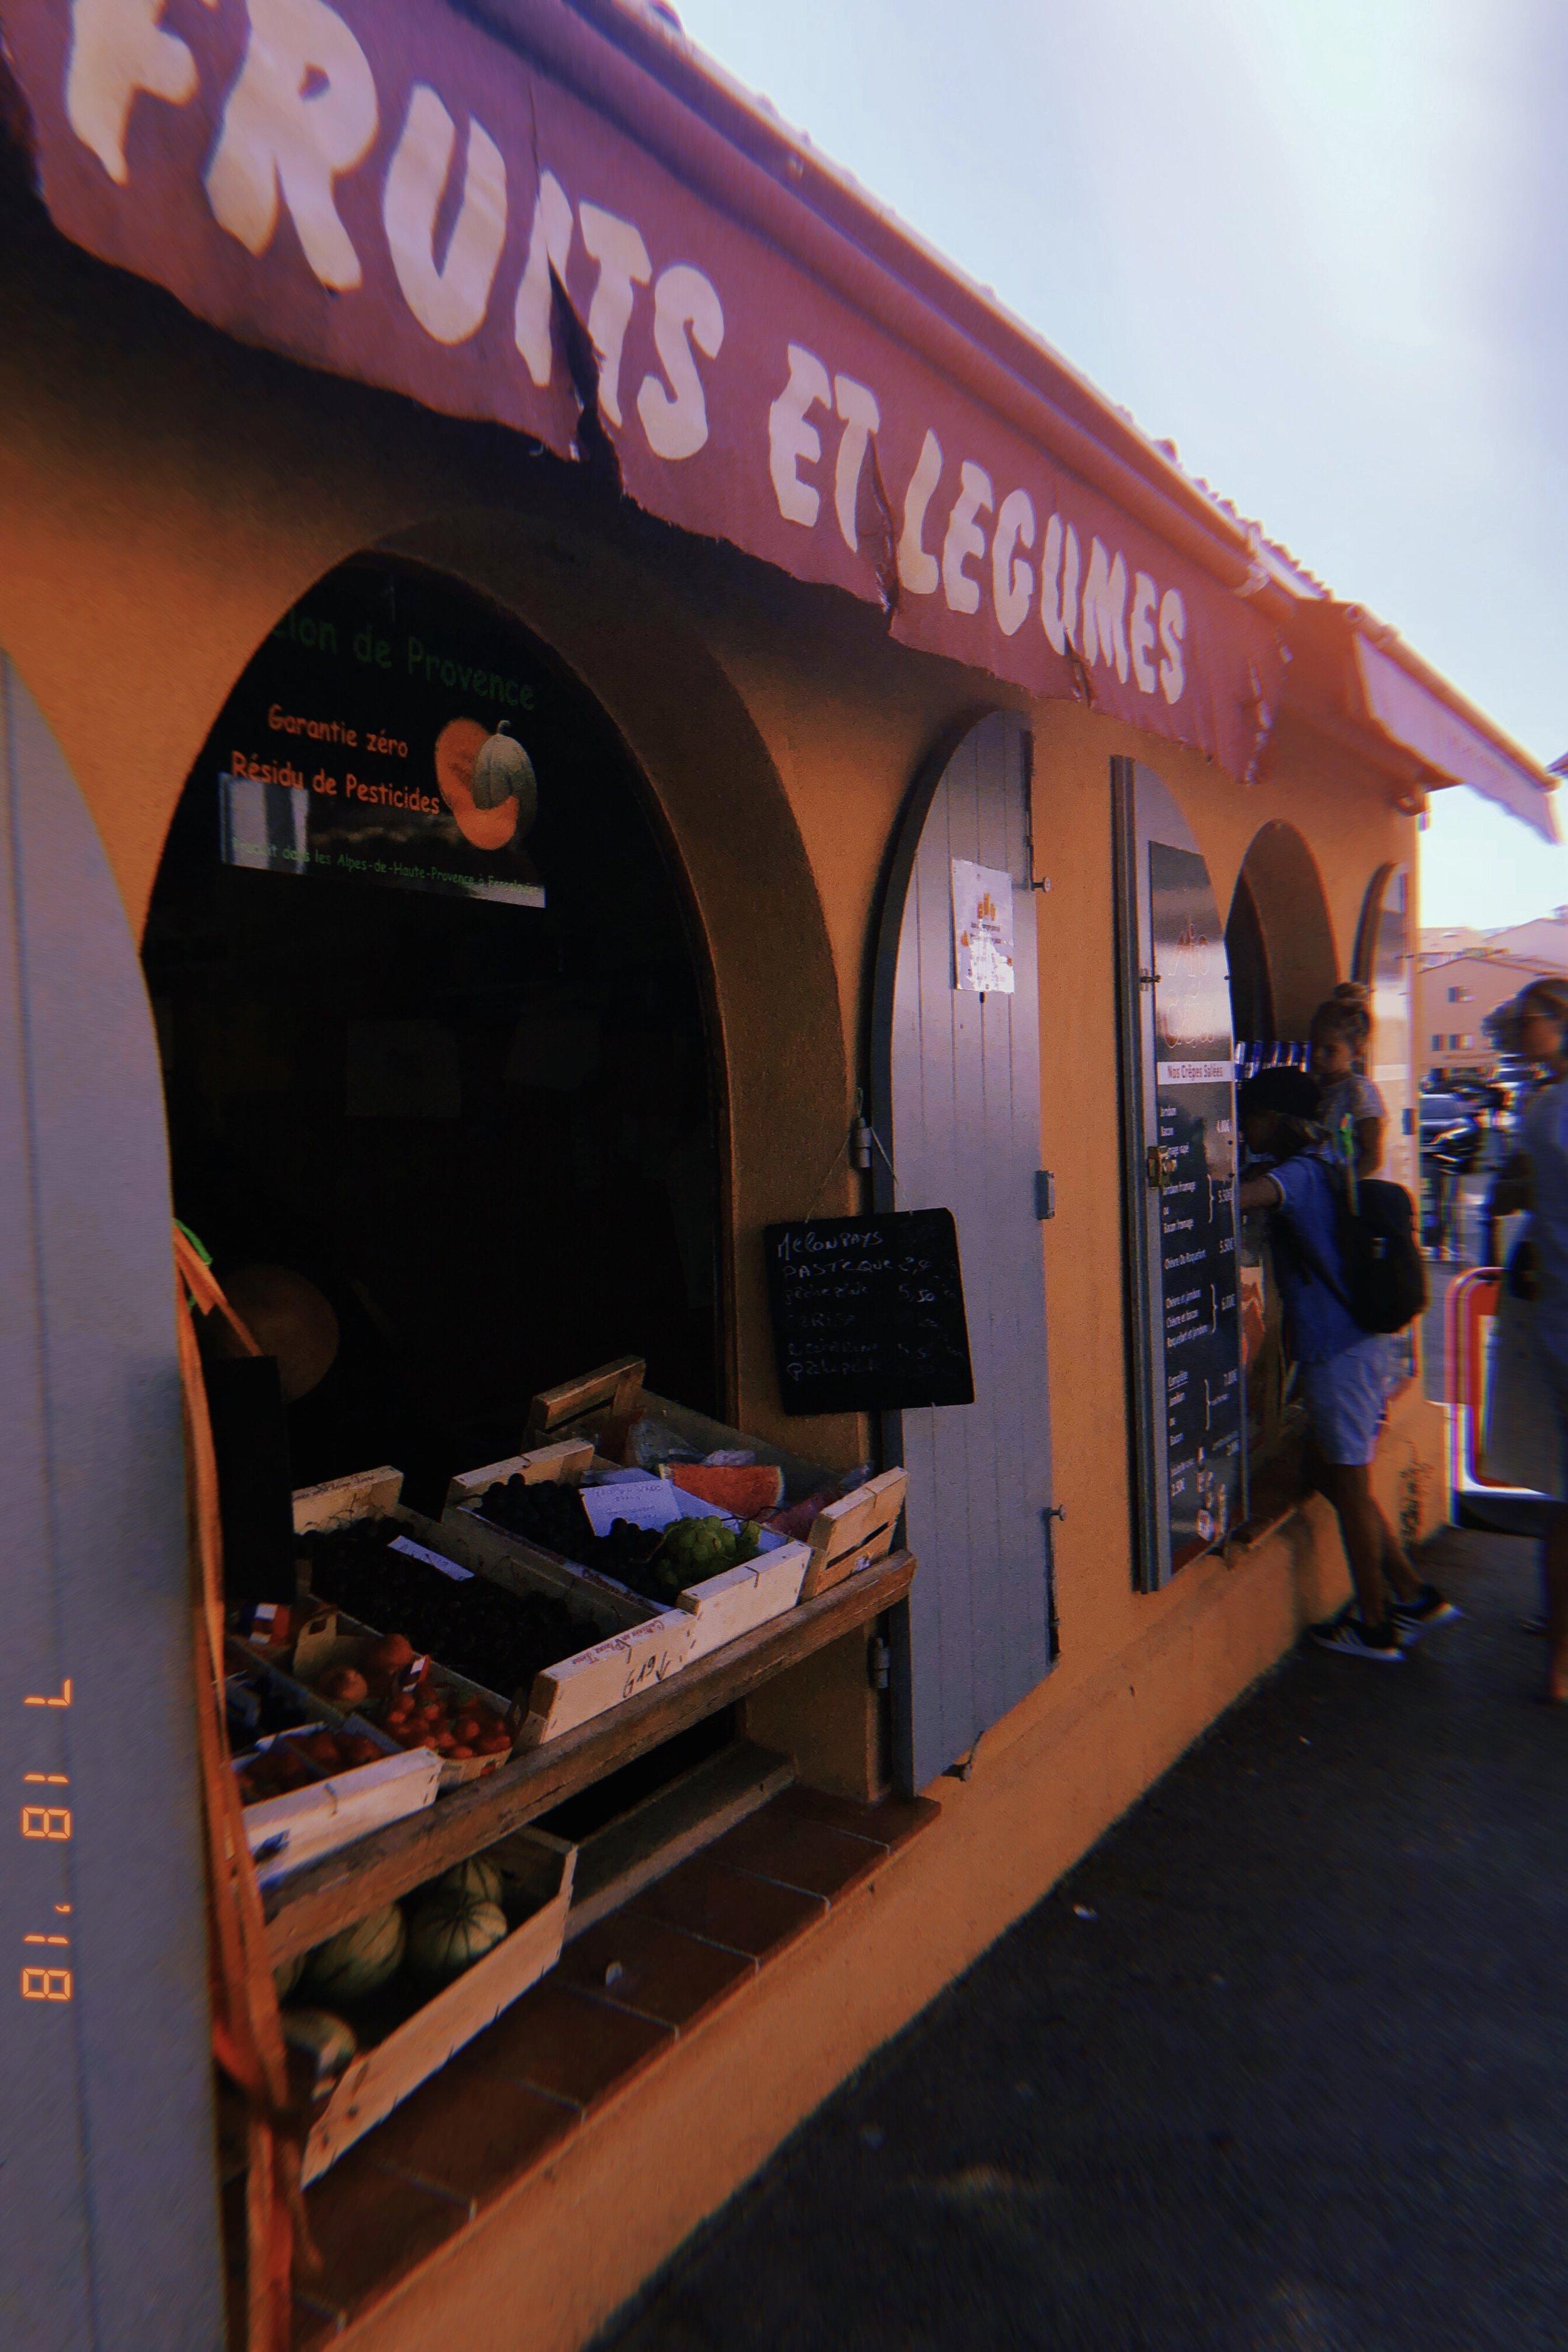 The French Riviera Saint Tropez Julia Friedman